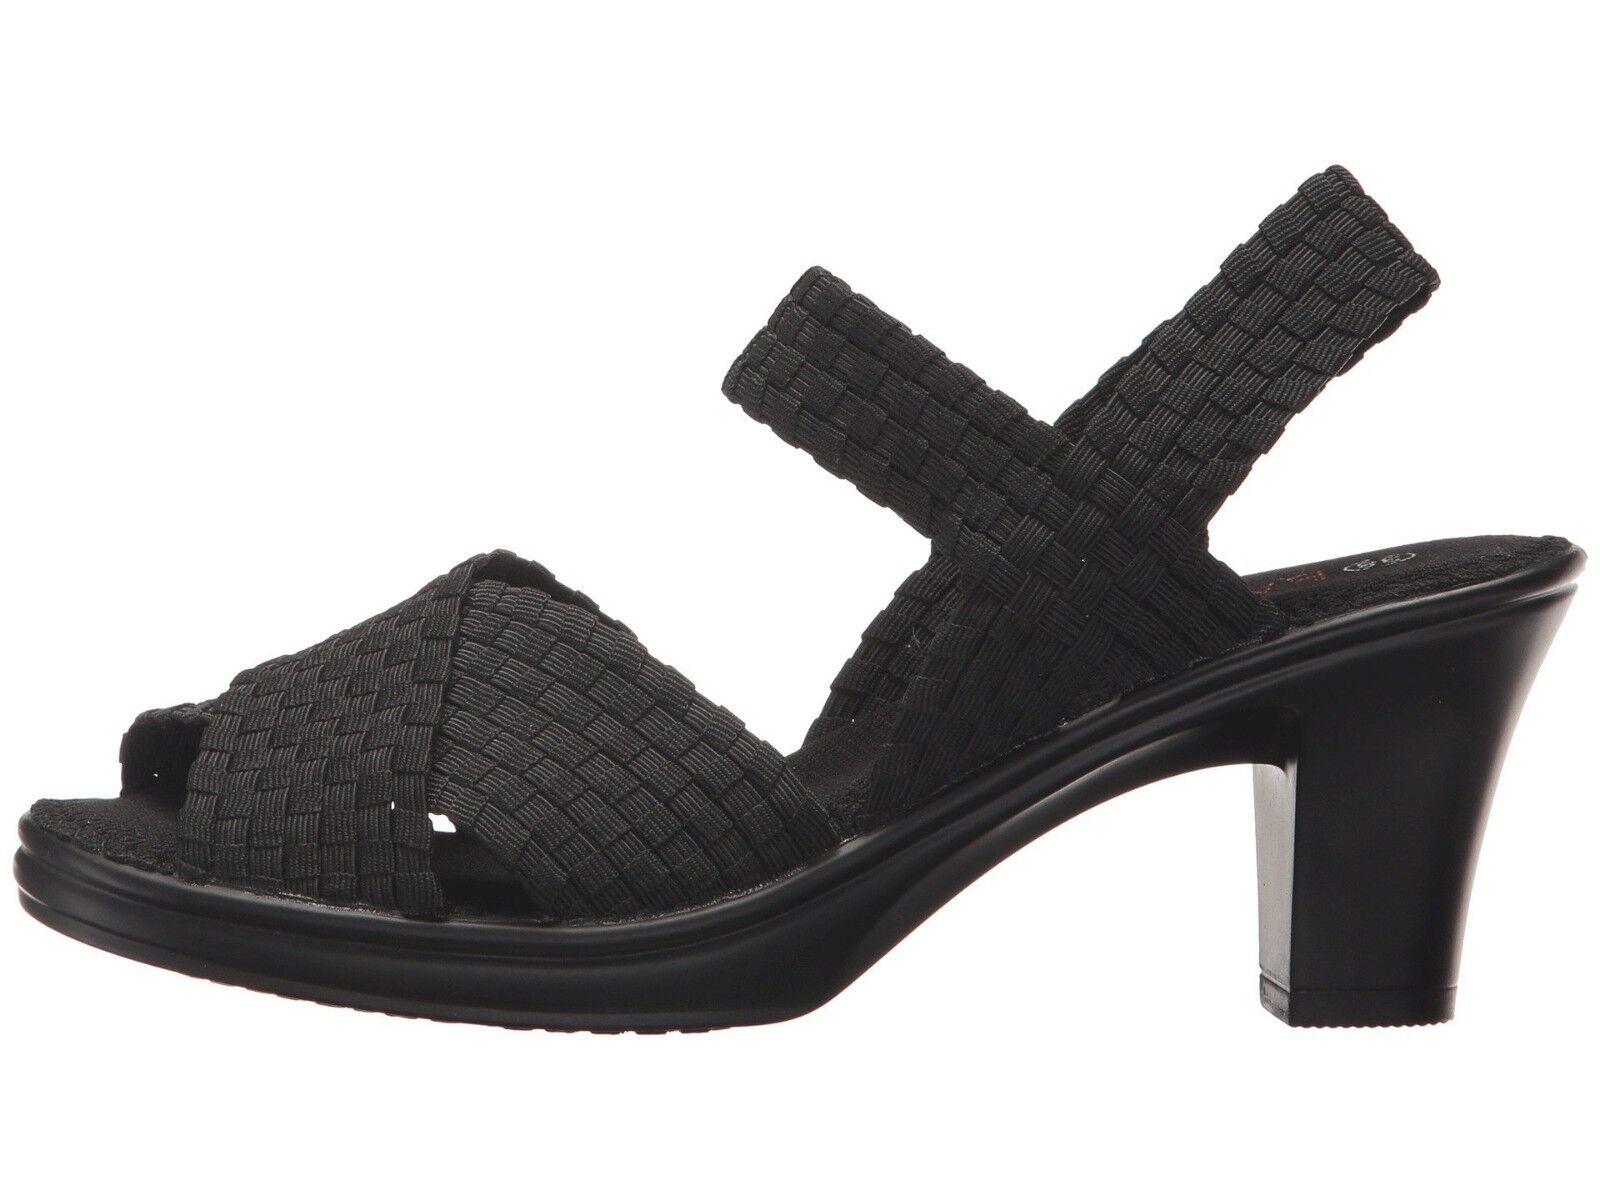 Bernie Mev Depurple Black Women's Sandal